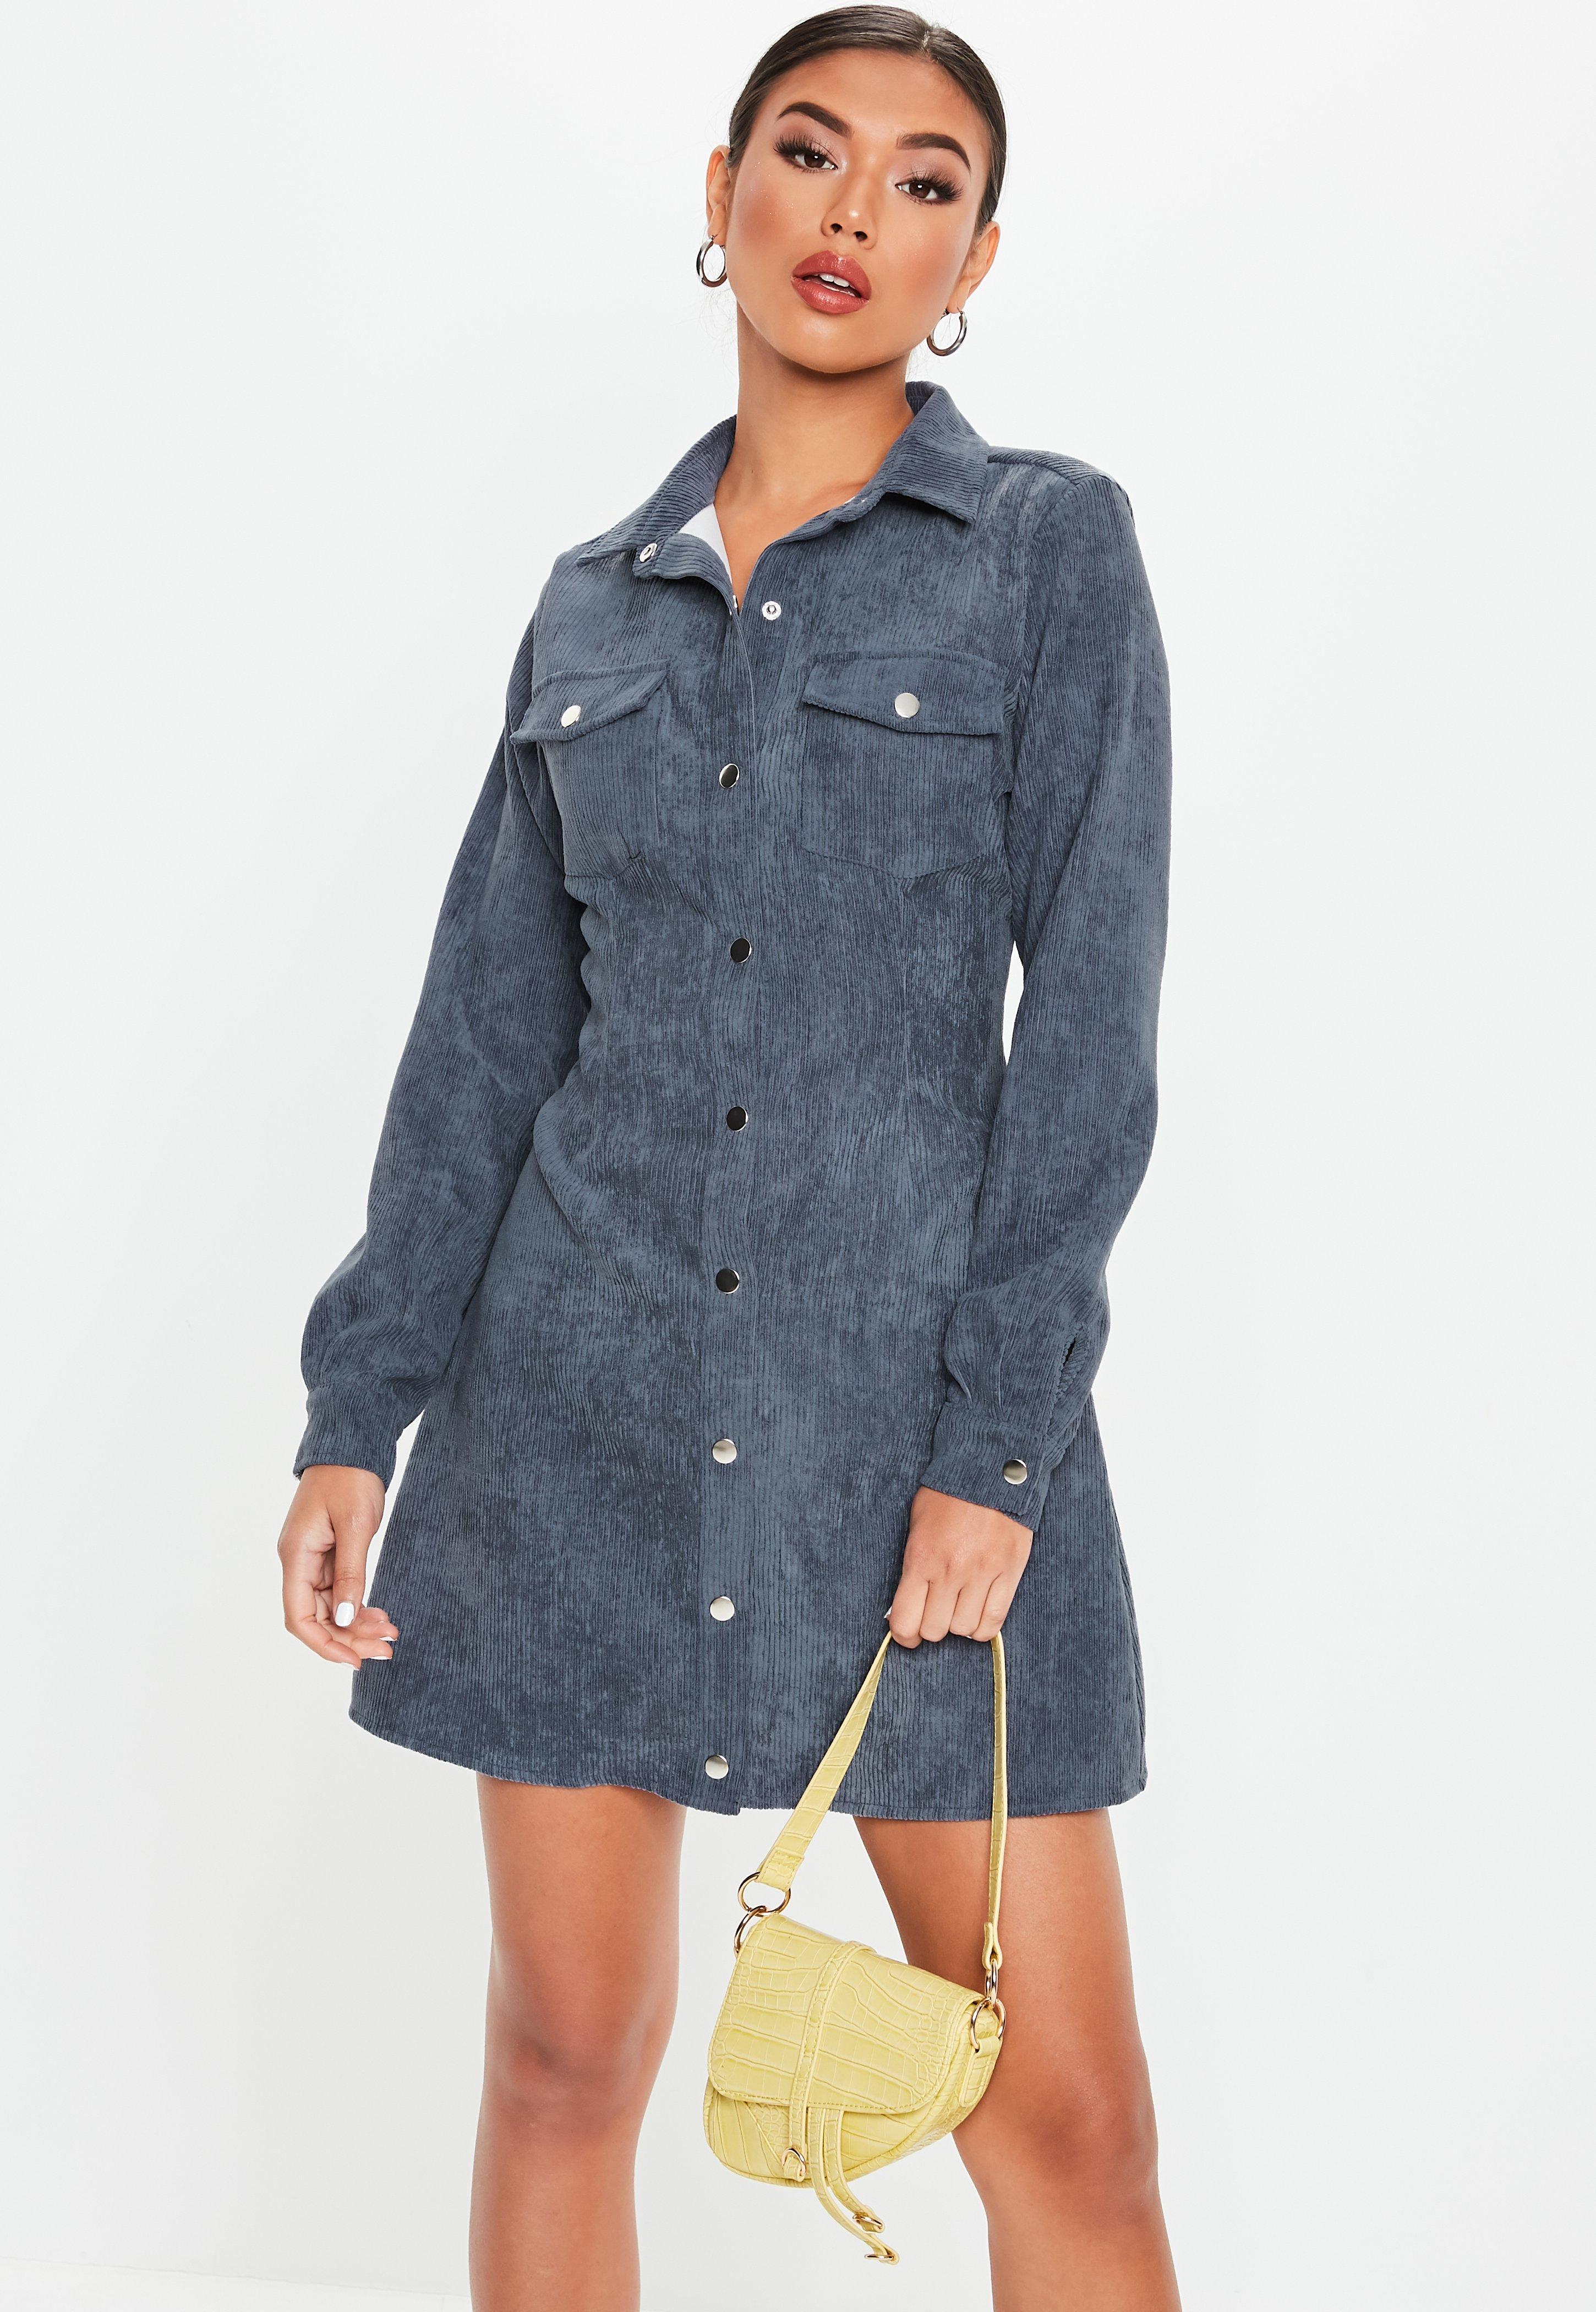 Robes   Robe chic femme en ligne 2019 - Missguided c64537070f24